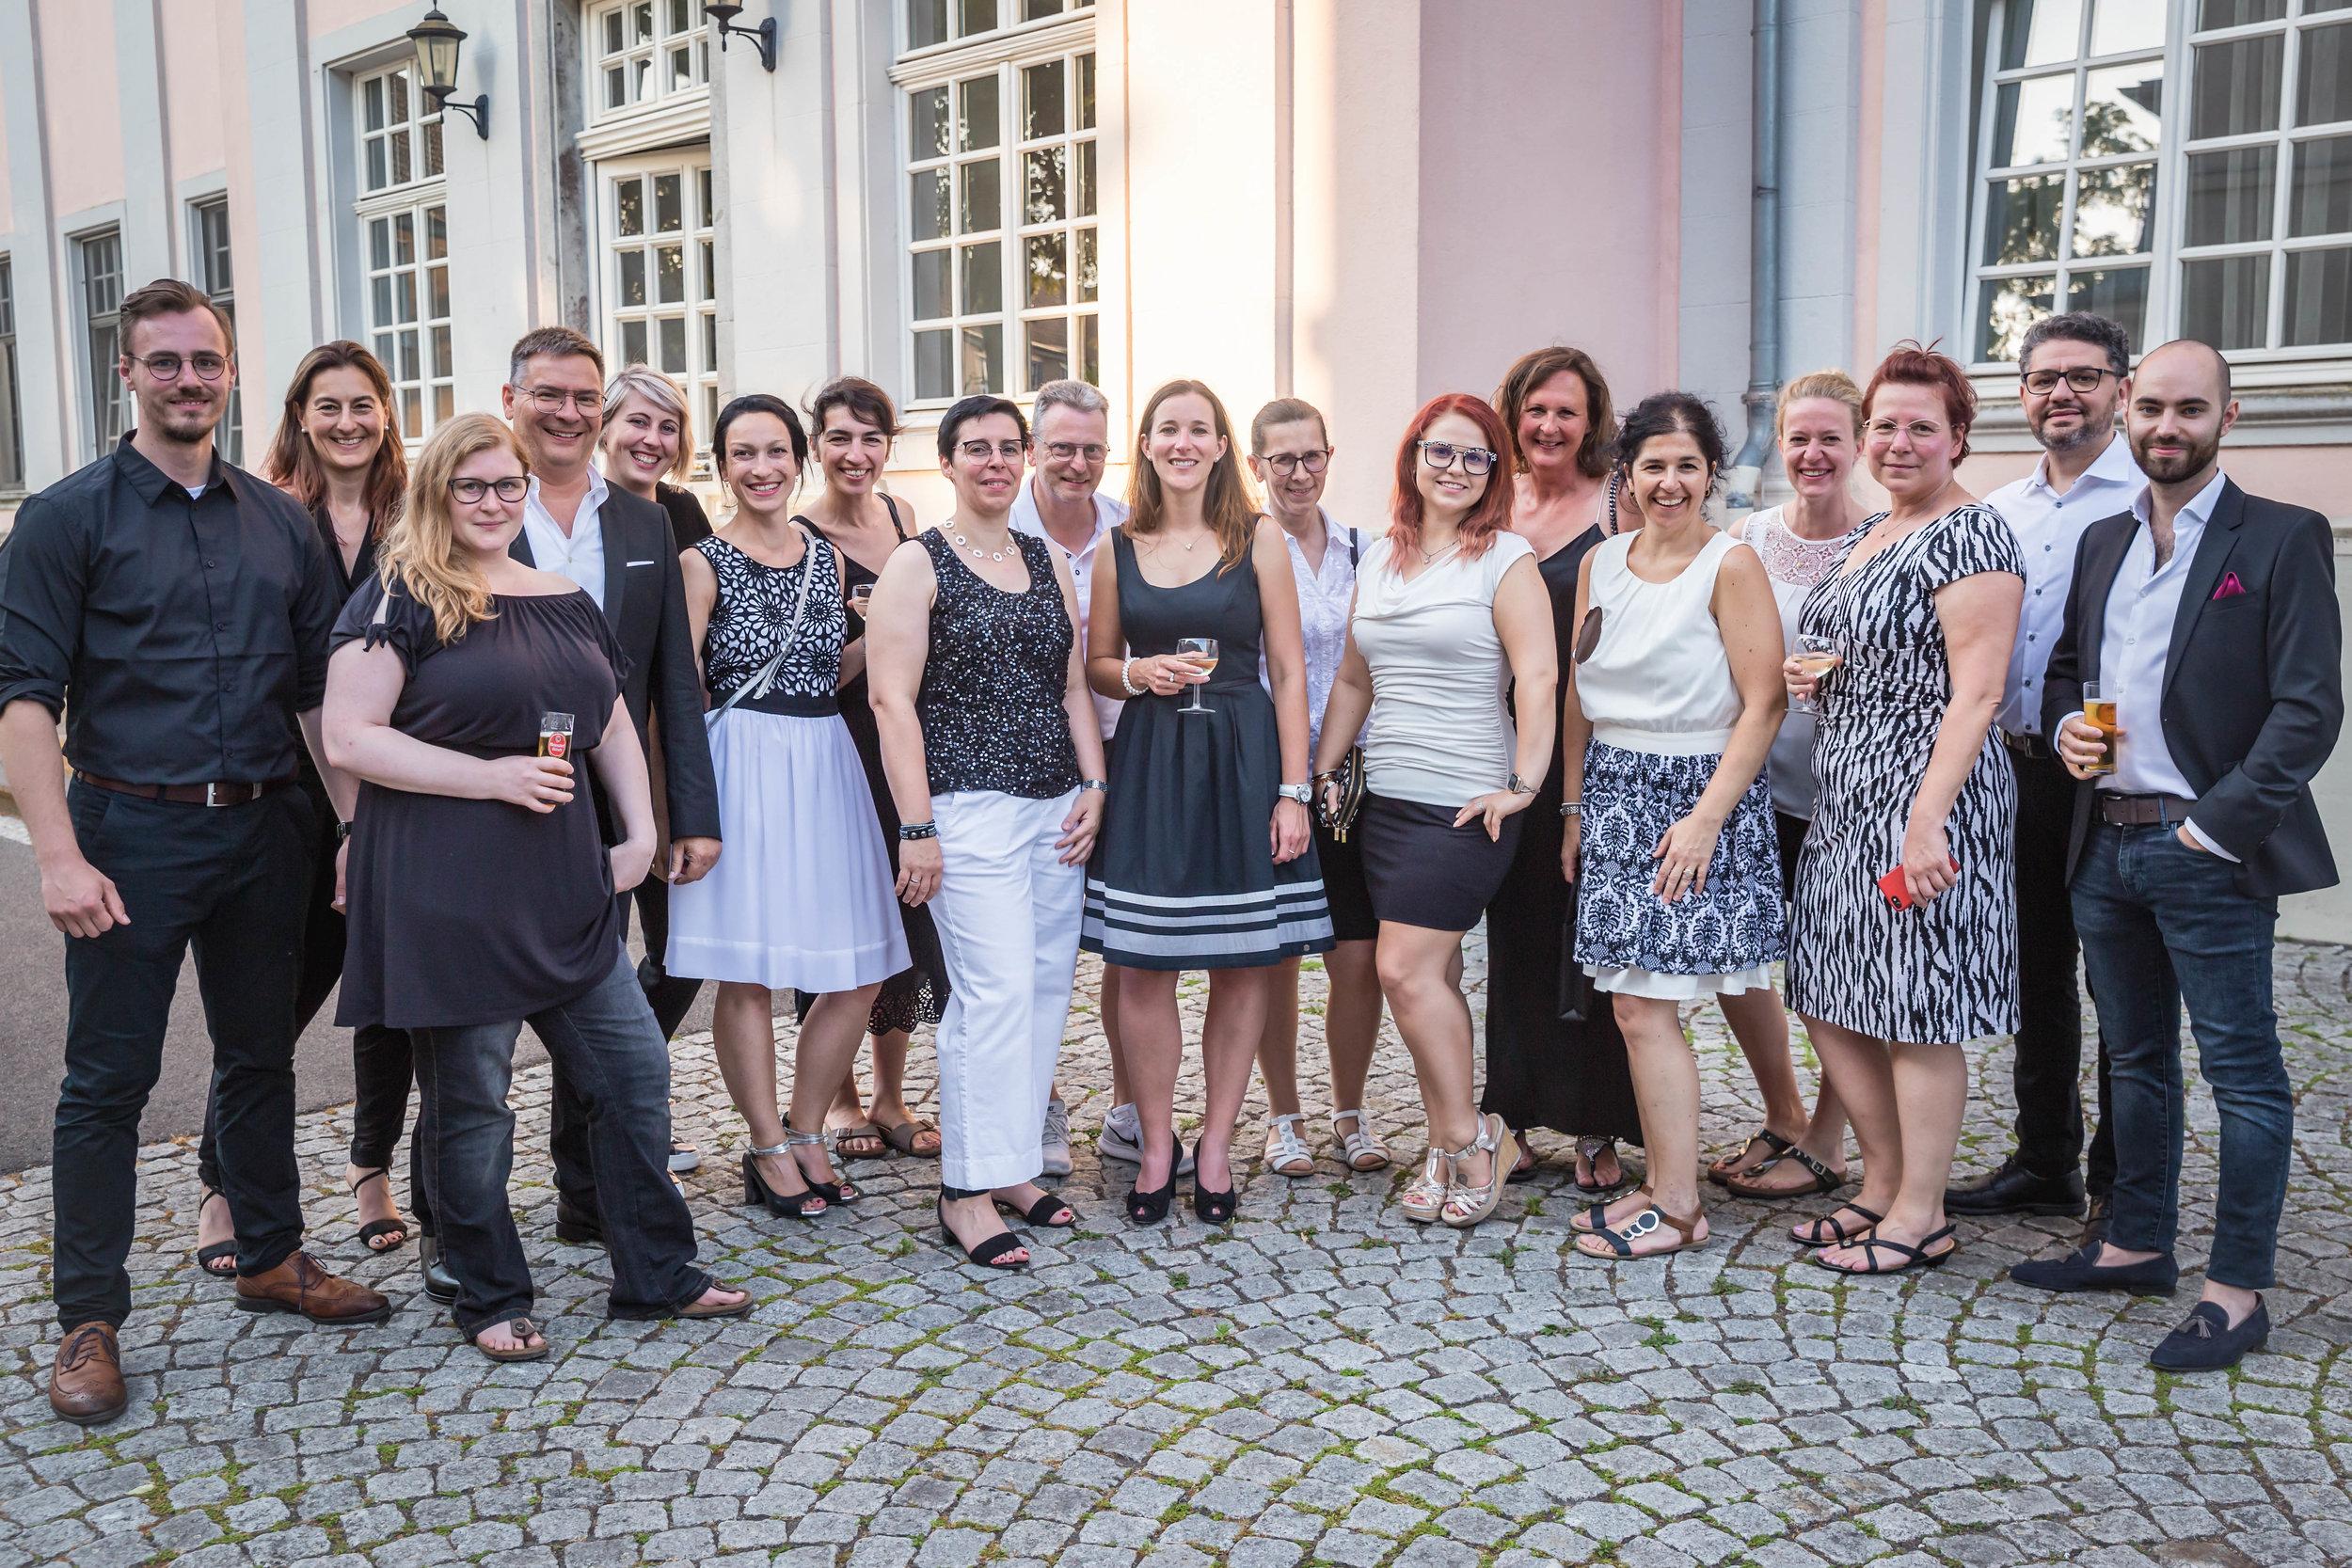 20190626_Akademie_40-jähriges_Jubiläum_FB_kl-5311922.jpg